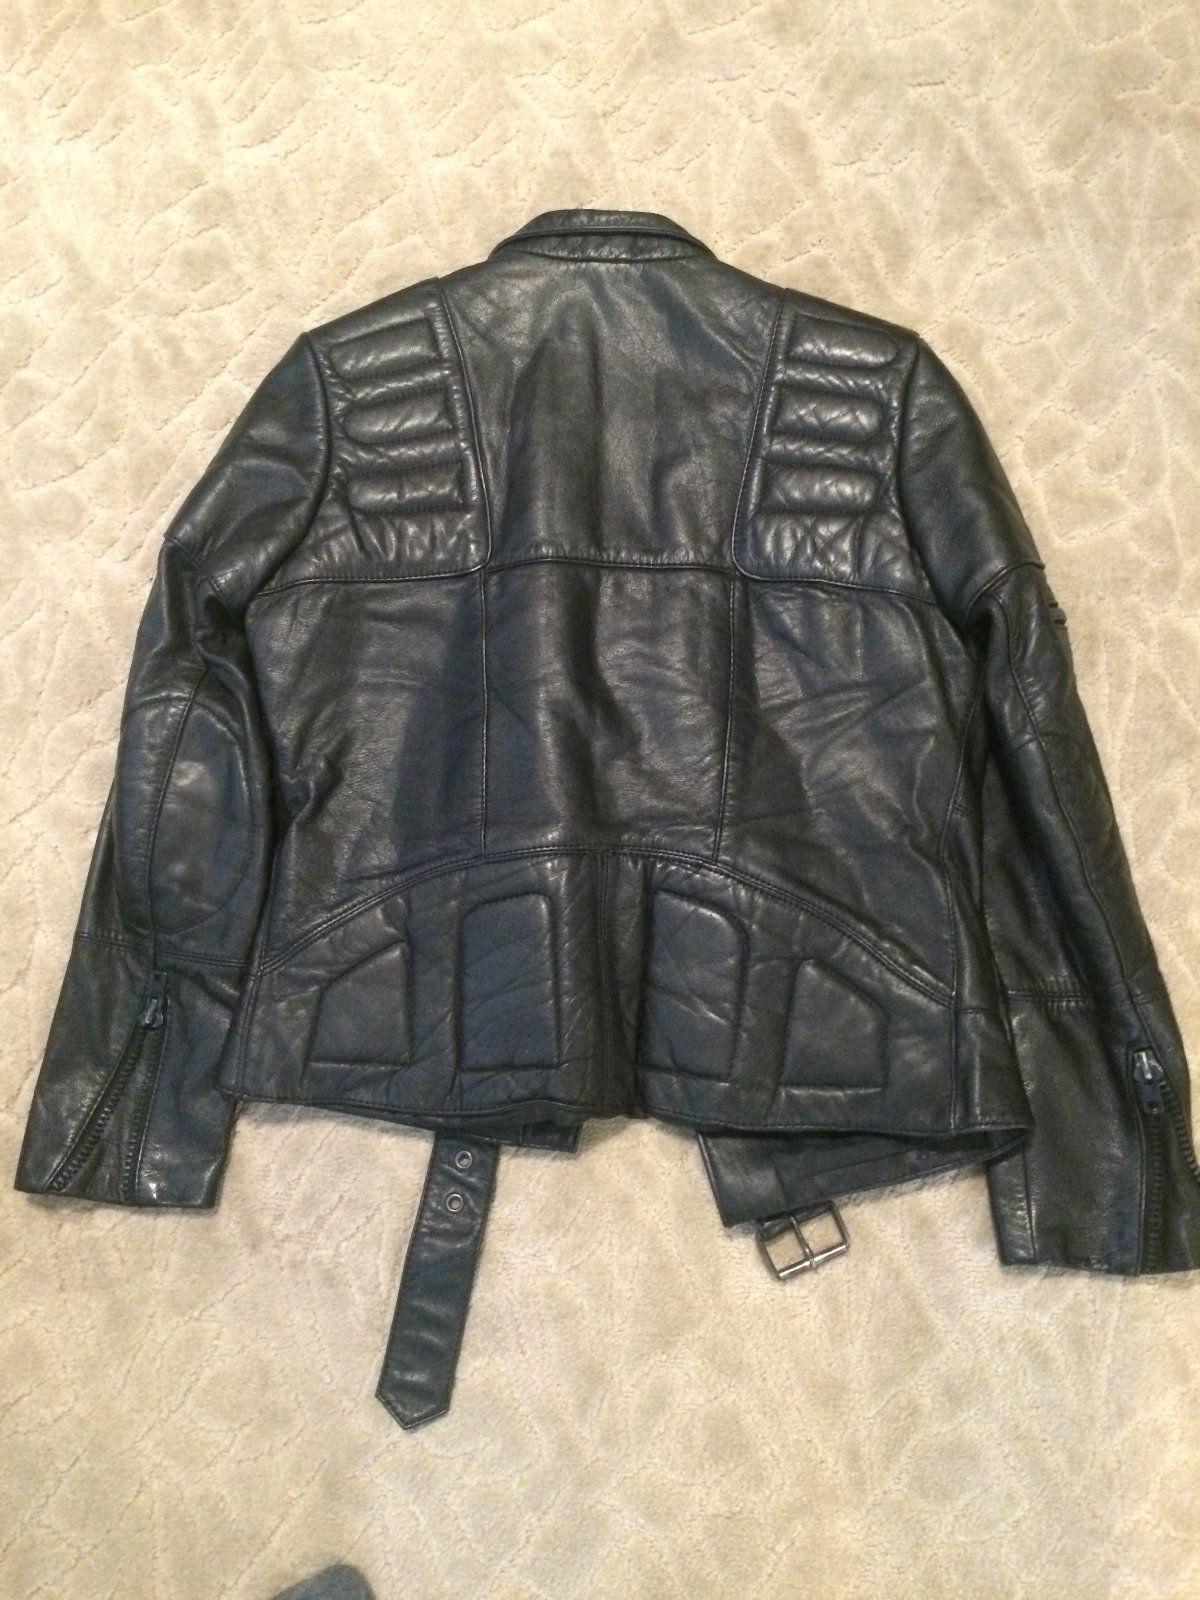 harley davidson leather jackets ebay uk - nils stucki kieferorthopäde